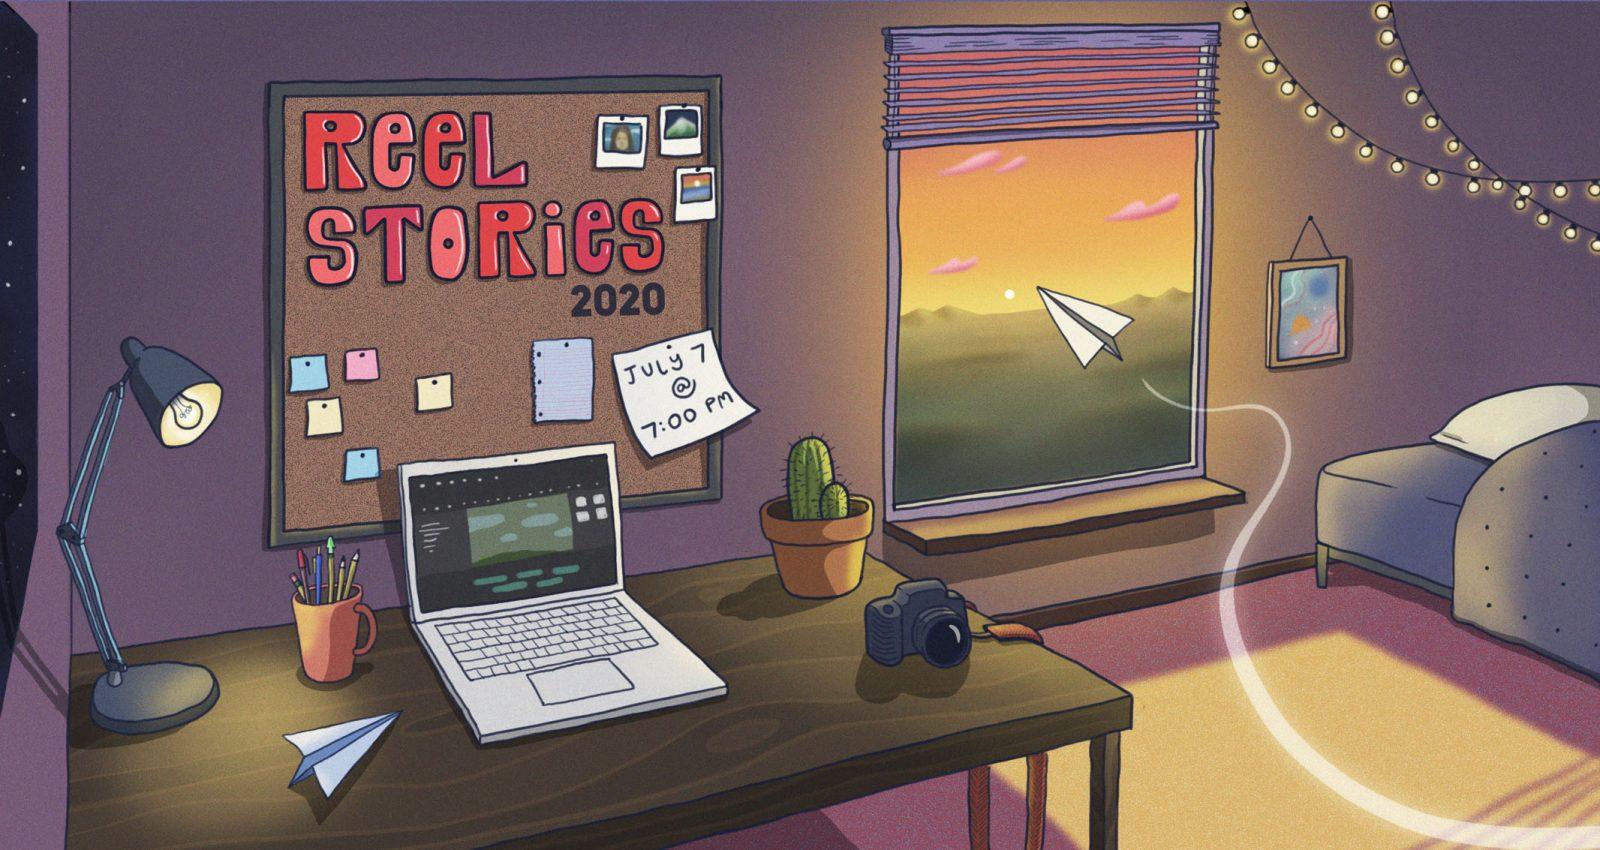 REEL StoriesWeb Feature Banner (1)